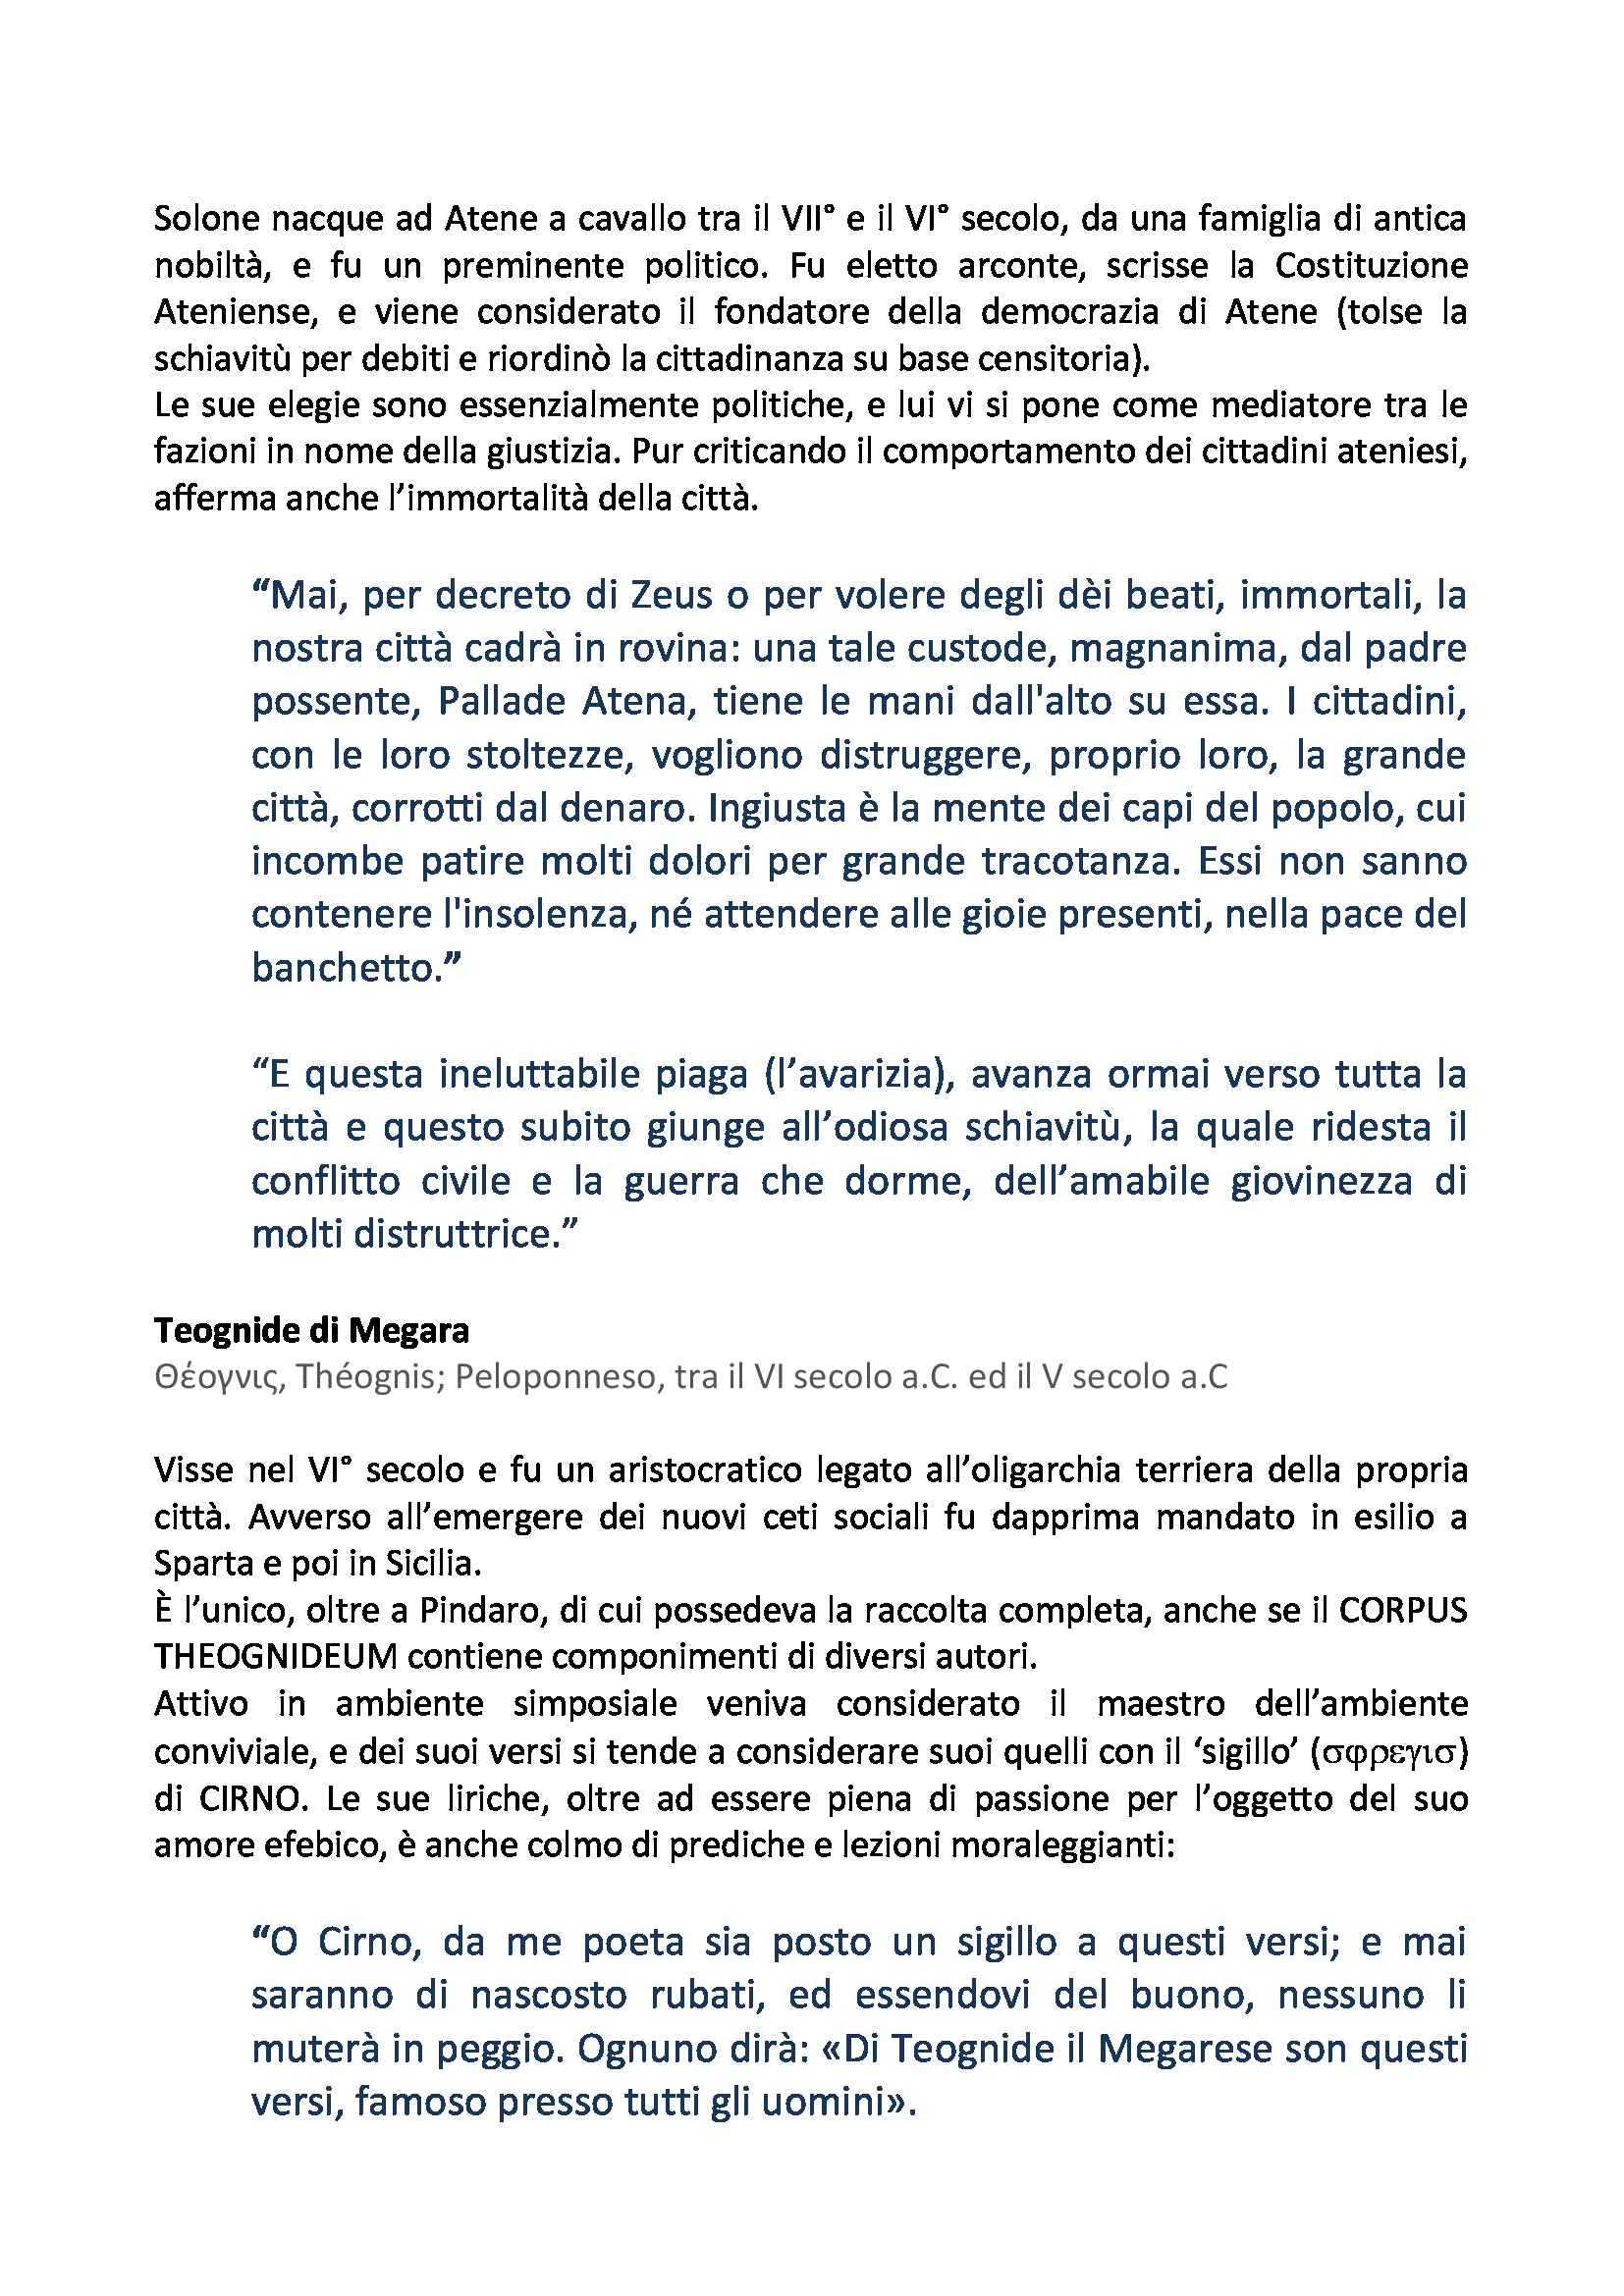 Introduzione alla Cultura Classica I  - Appunti Pag. 51